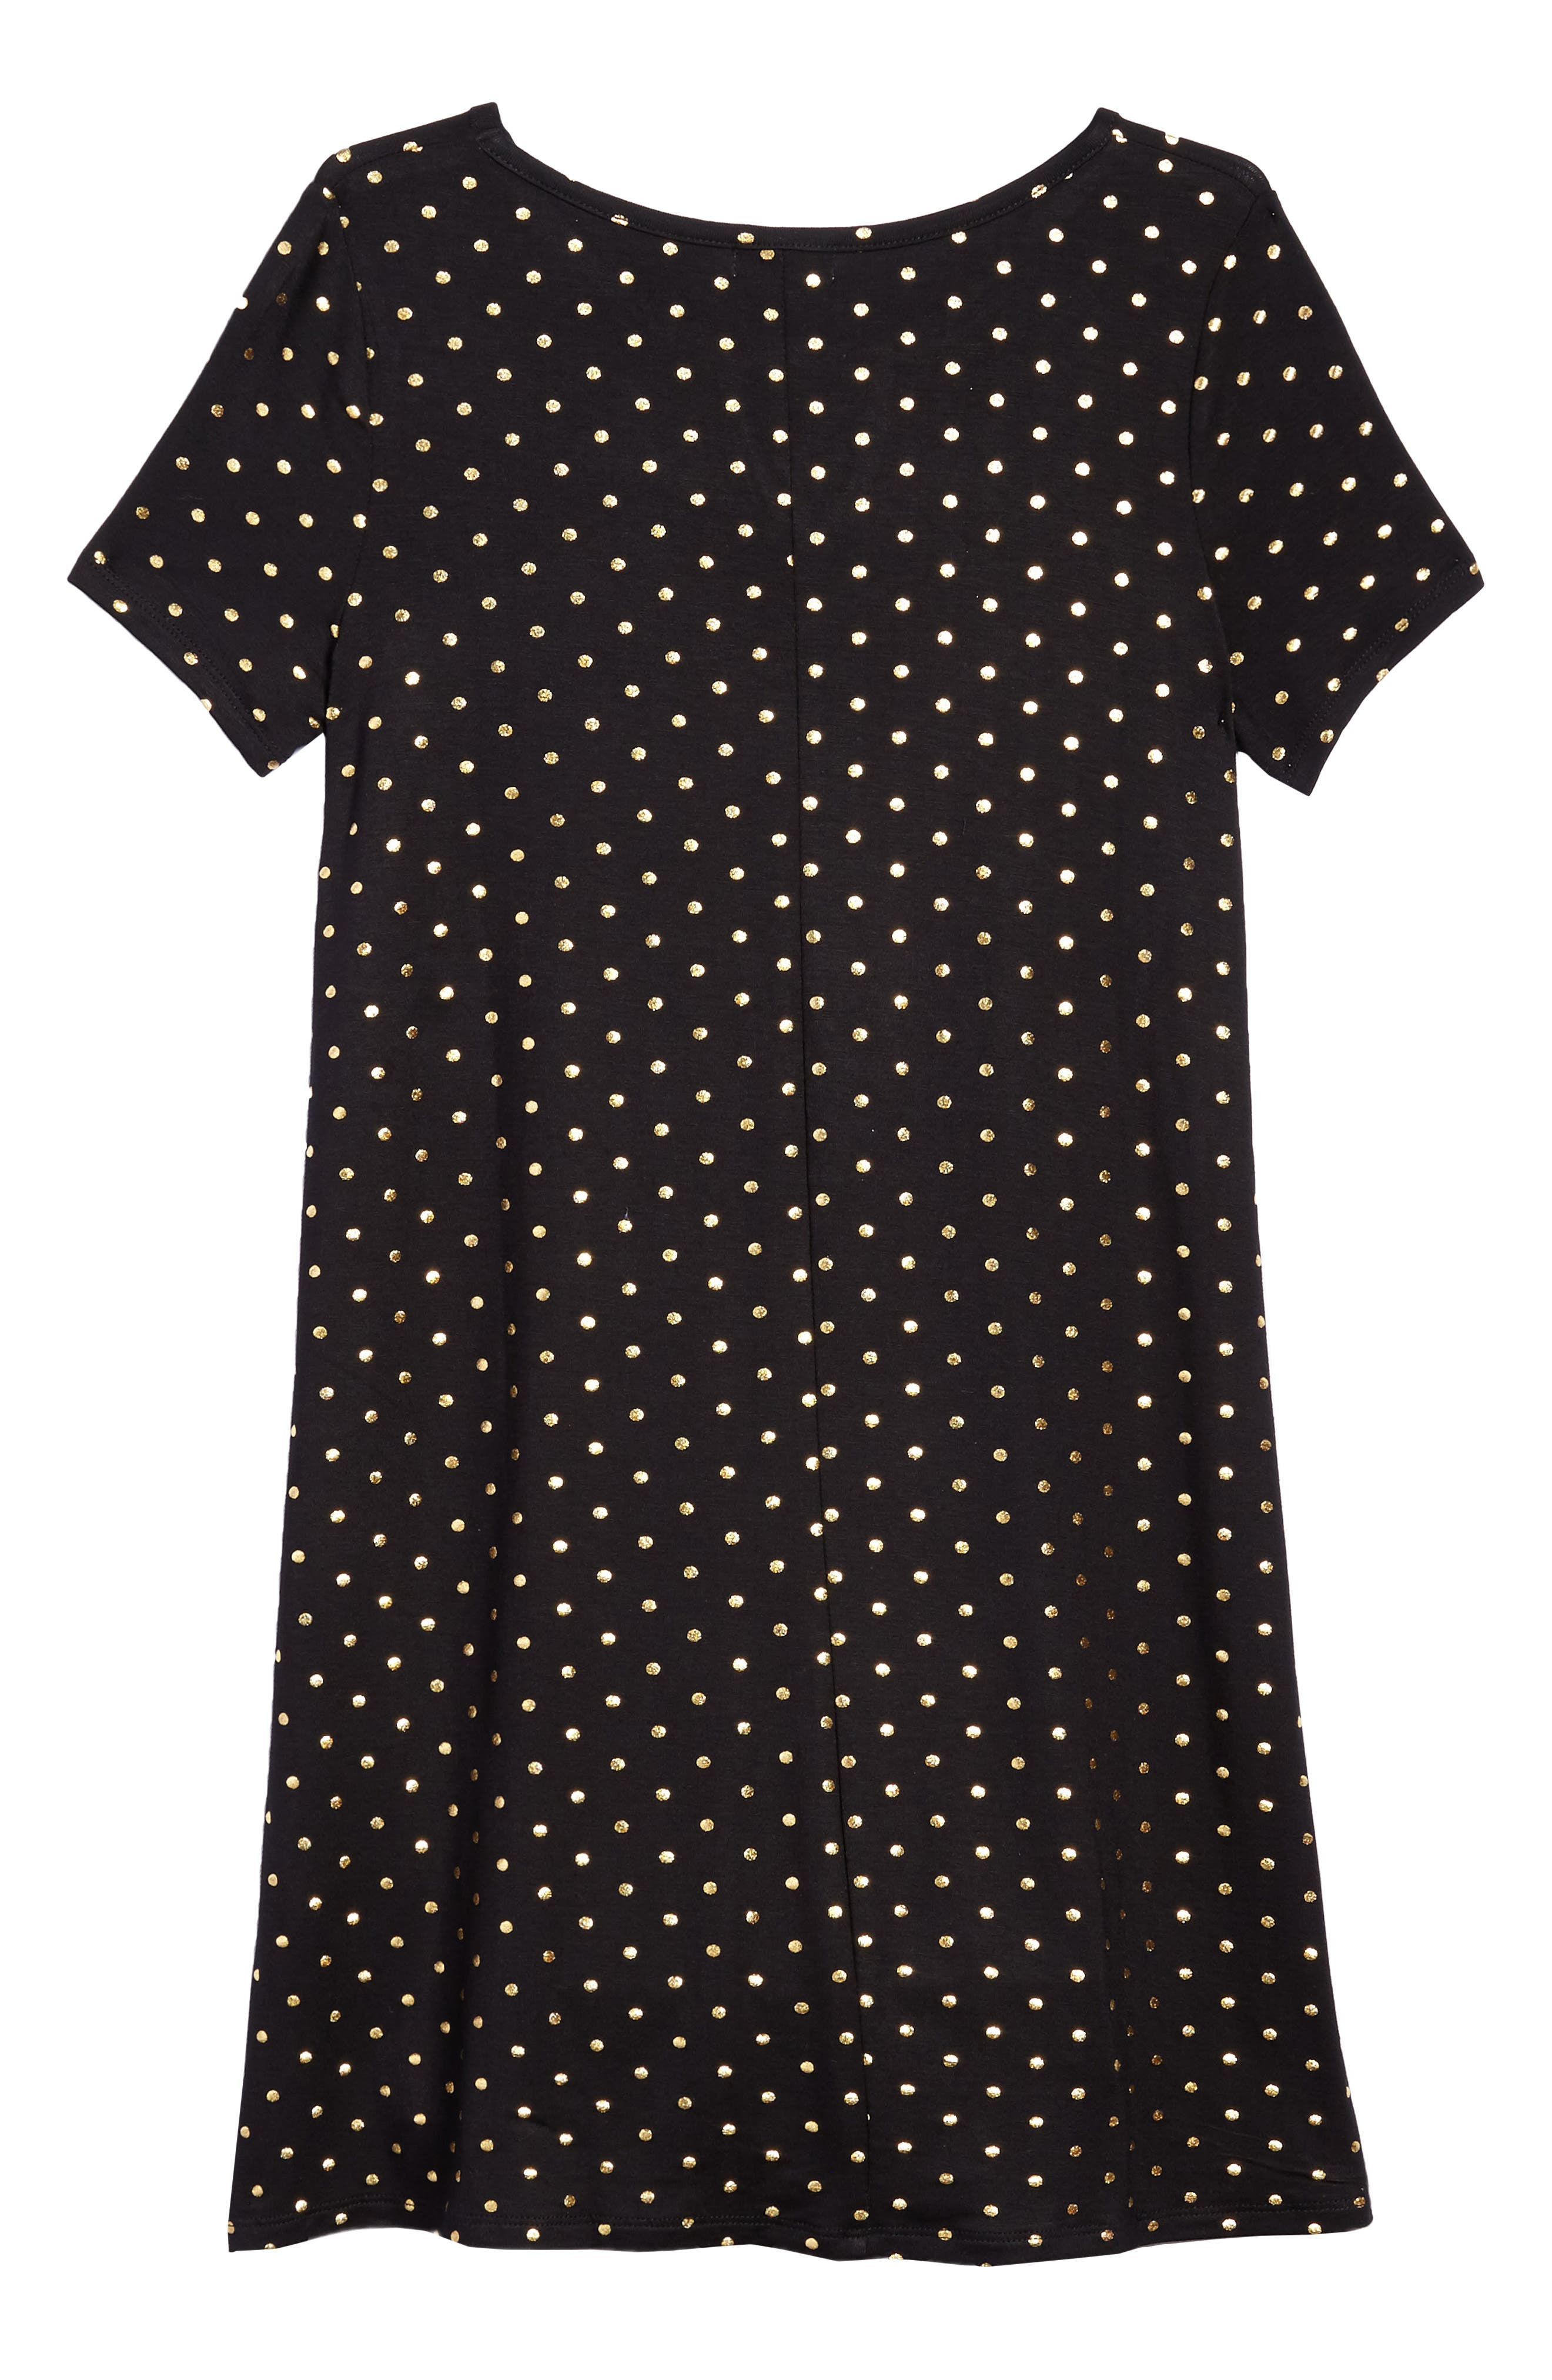 Foil Polka Dot Jersey Dress,                             Alternate thumbnail 2, color,                             005